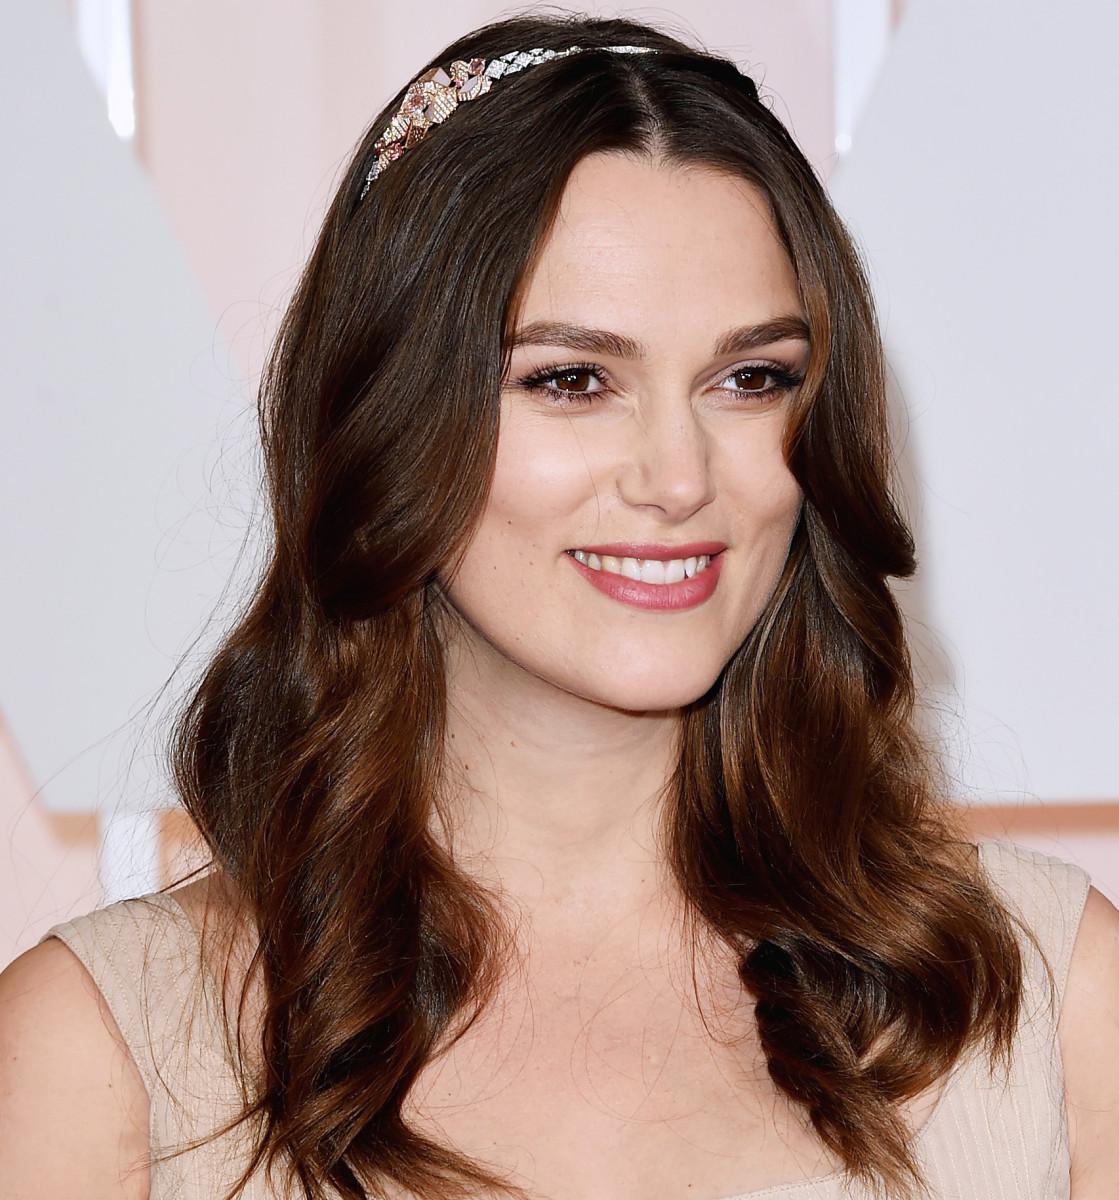 Keira Knightley 2015 Oscars makeup and headband